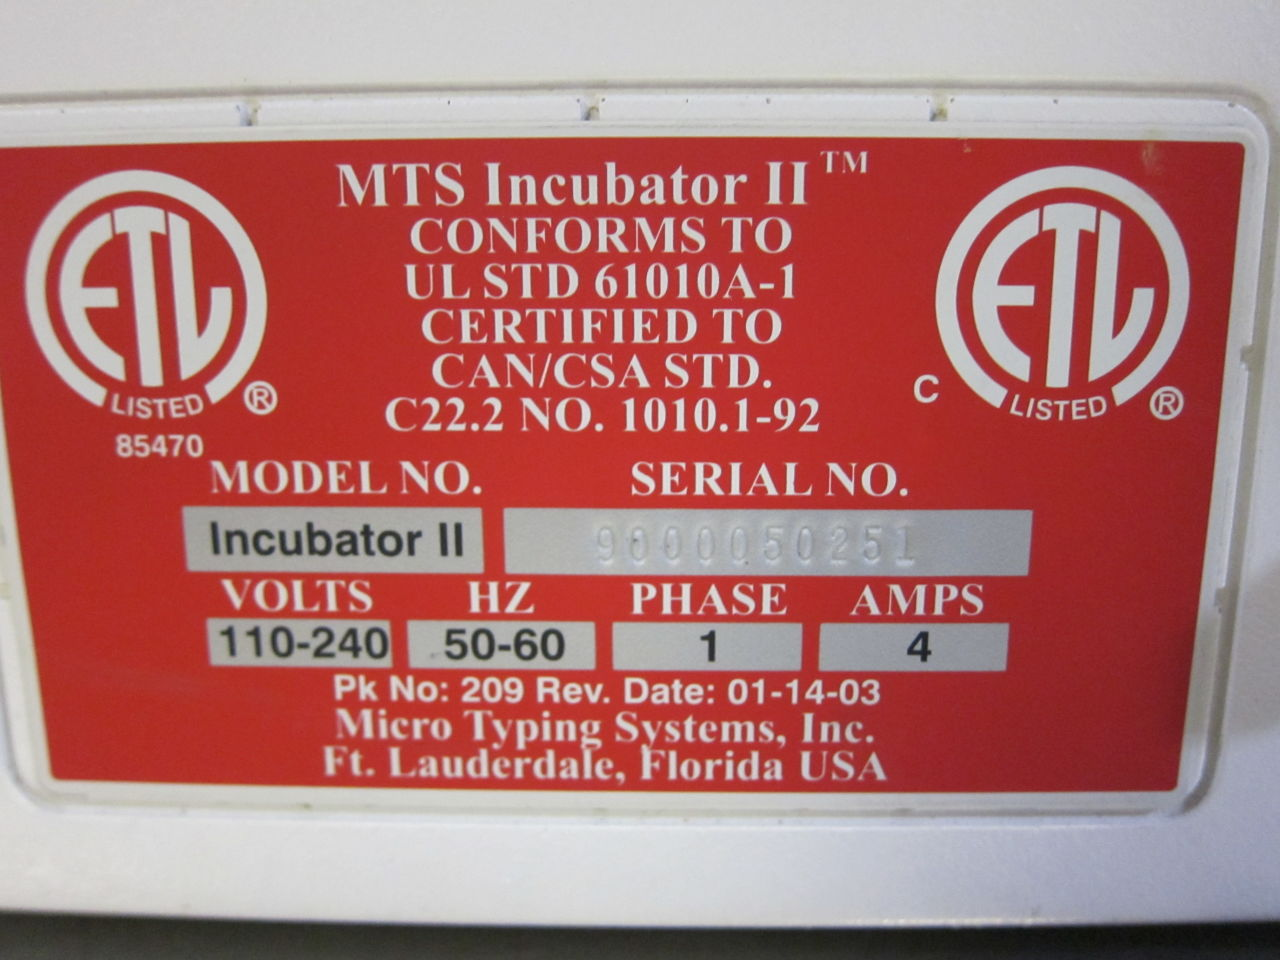 MTS Incubator II Incubator